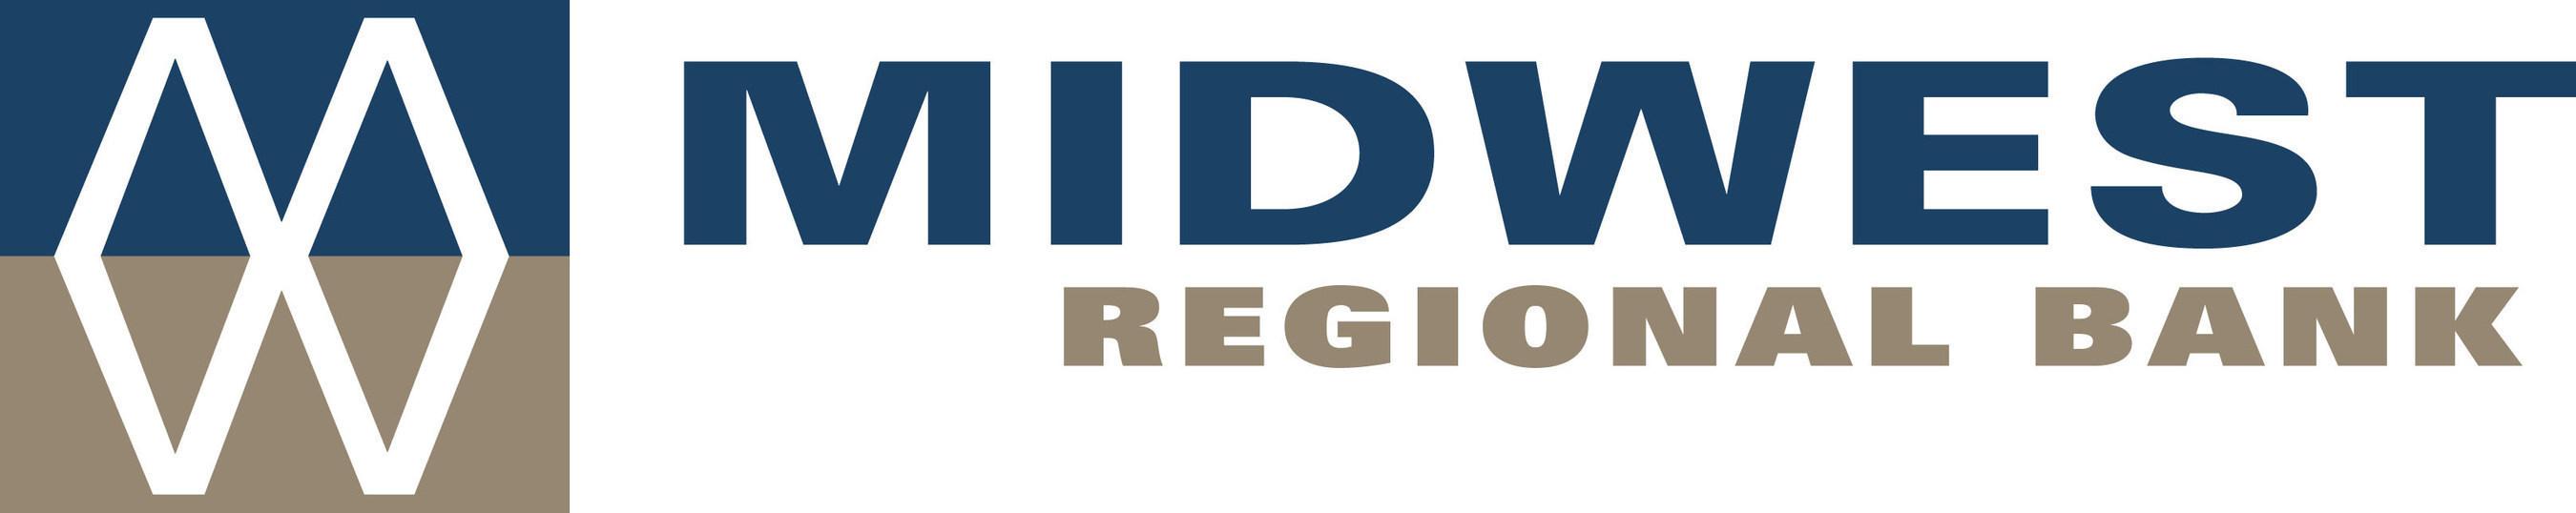 Midwest Regional Bank logo